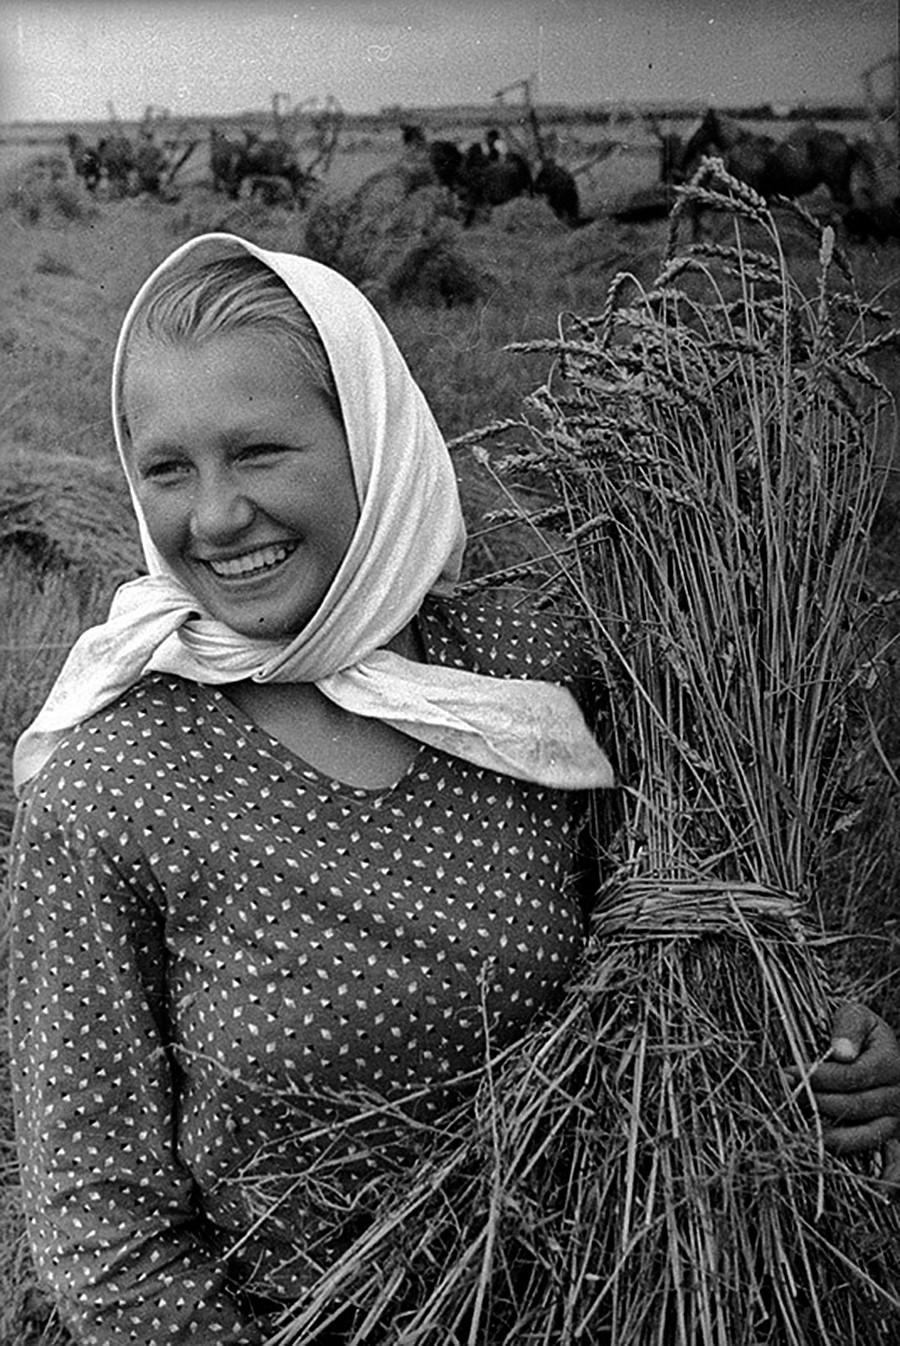 Ženska s snopom žita